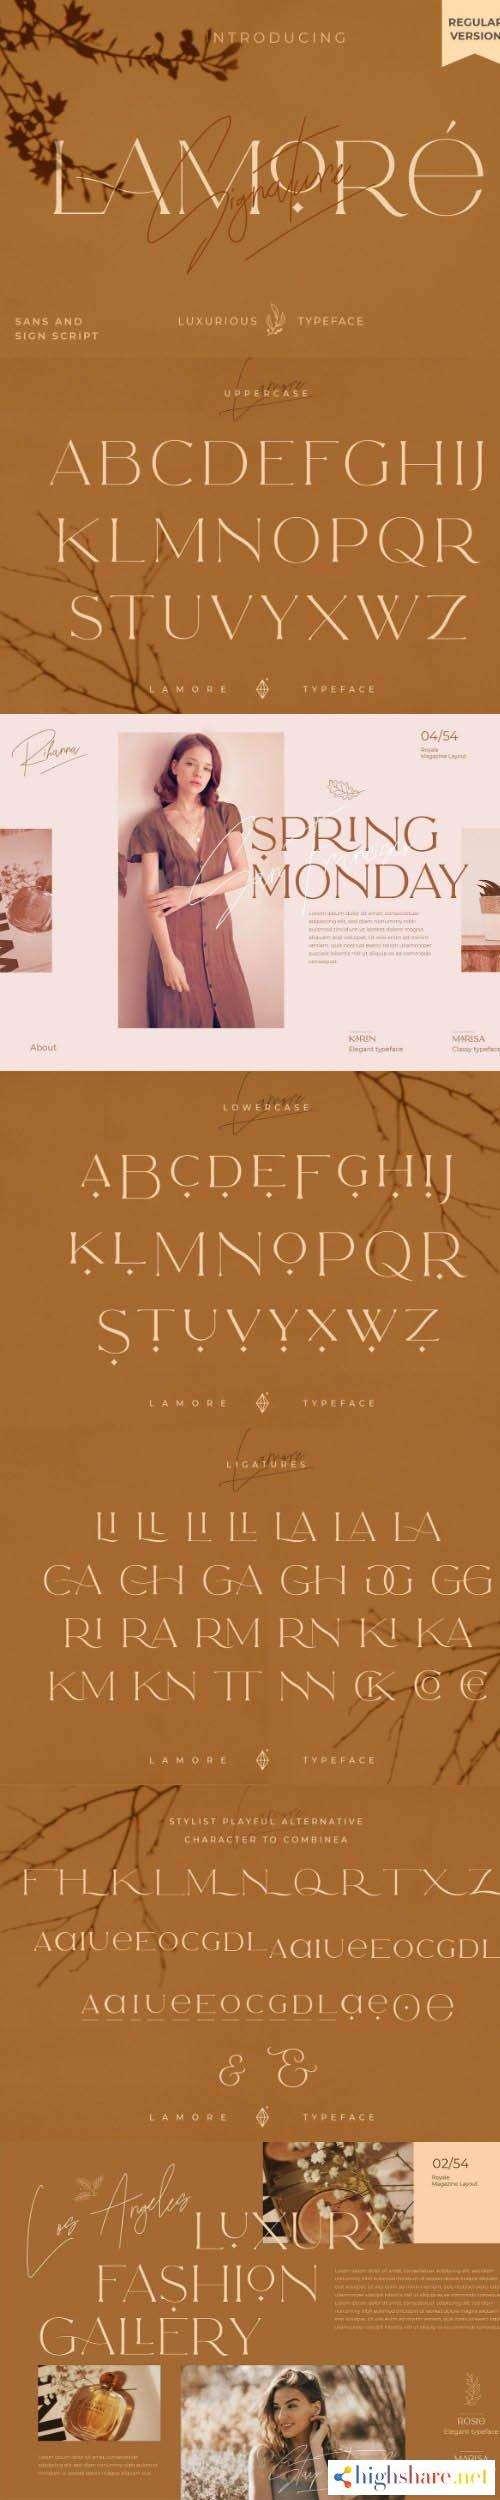 the lamore sans script typeface regular version 5f43a5d58a8d3 - The Lamore Sans & Script Typeface- Regular Version